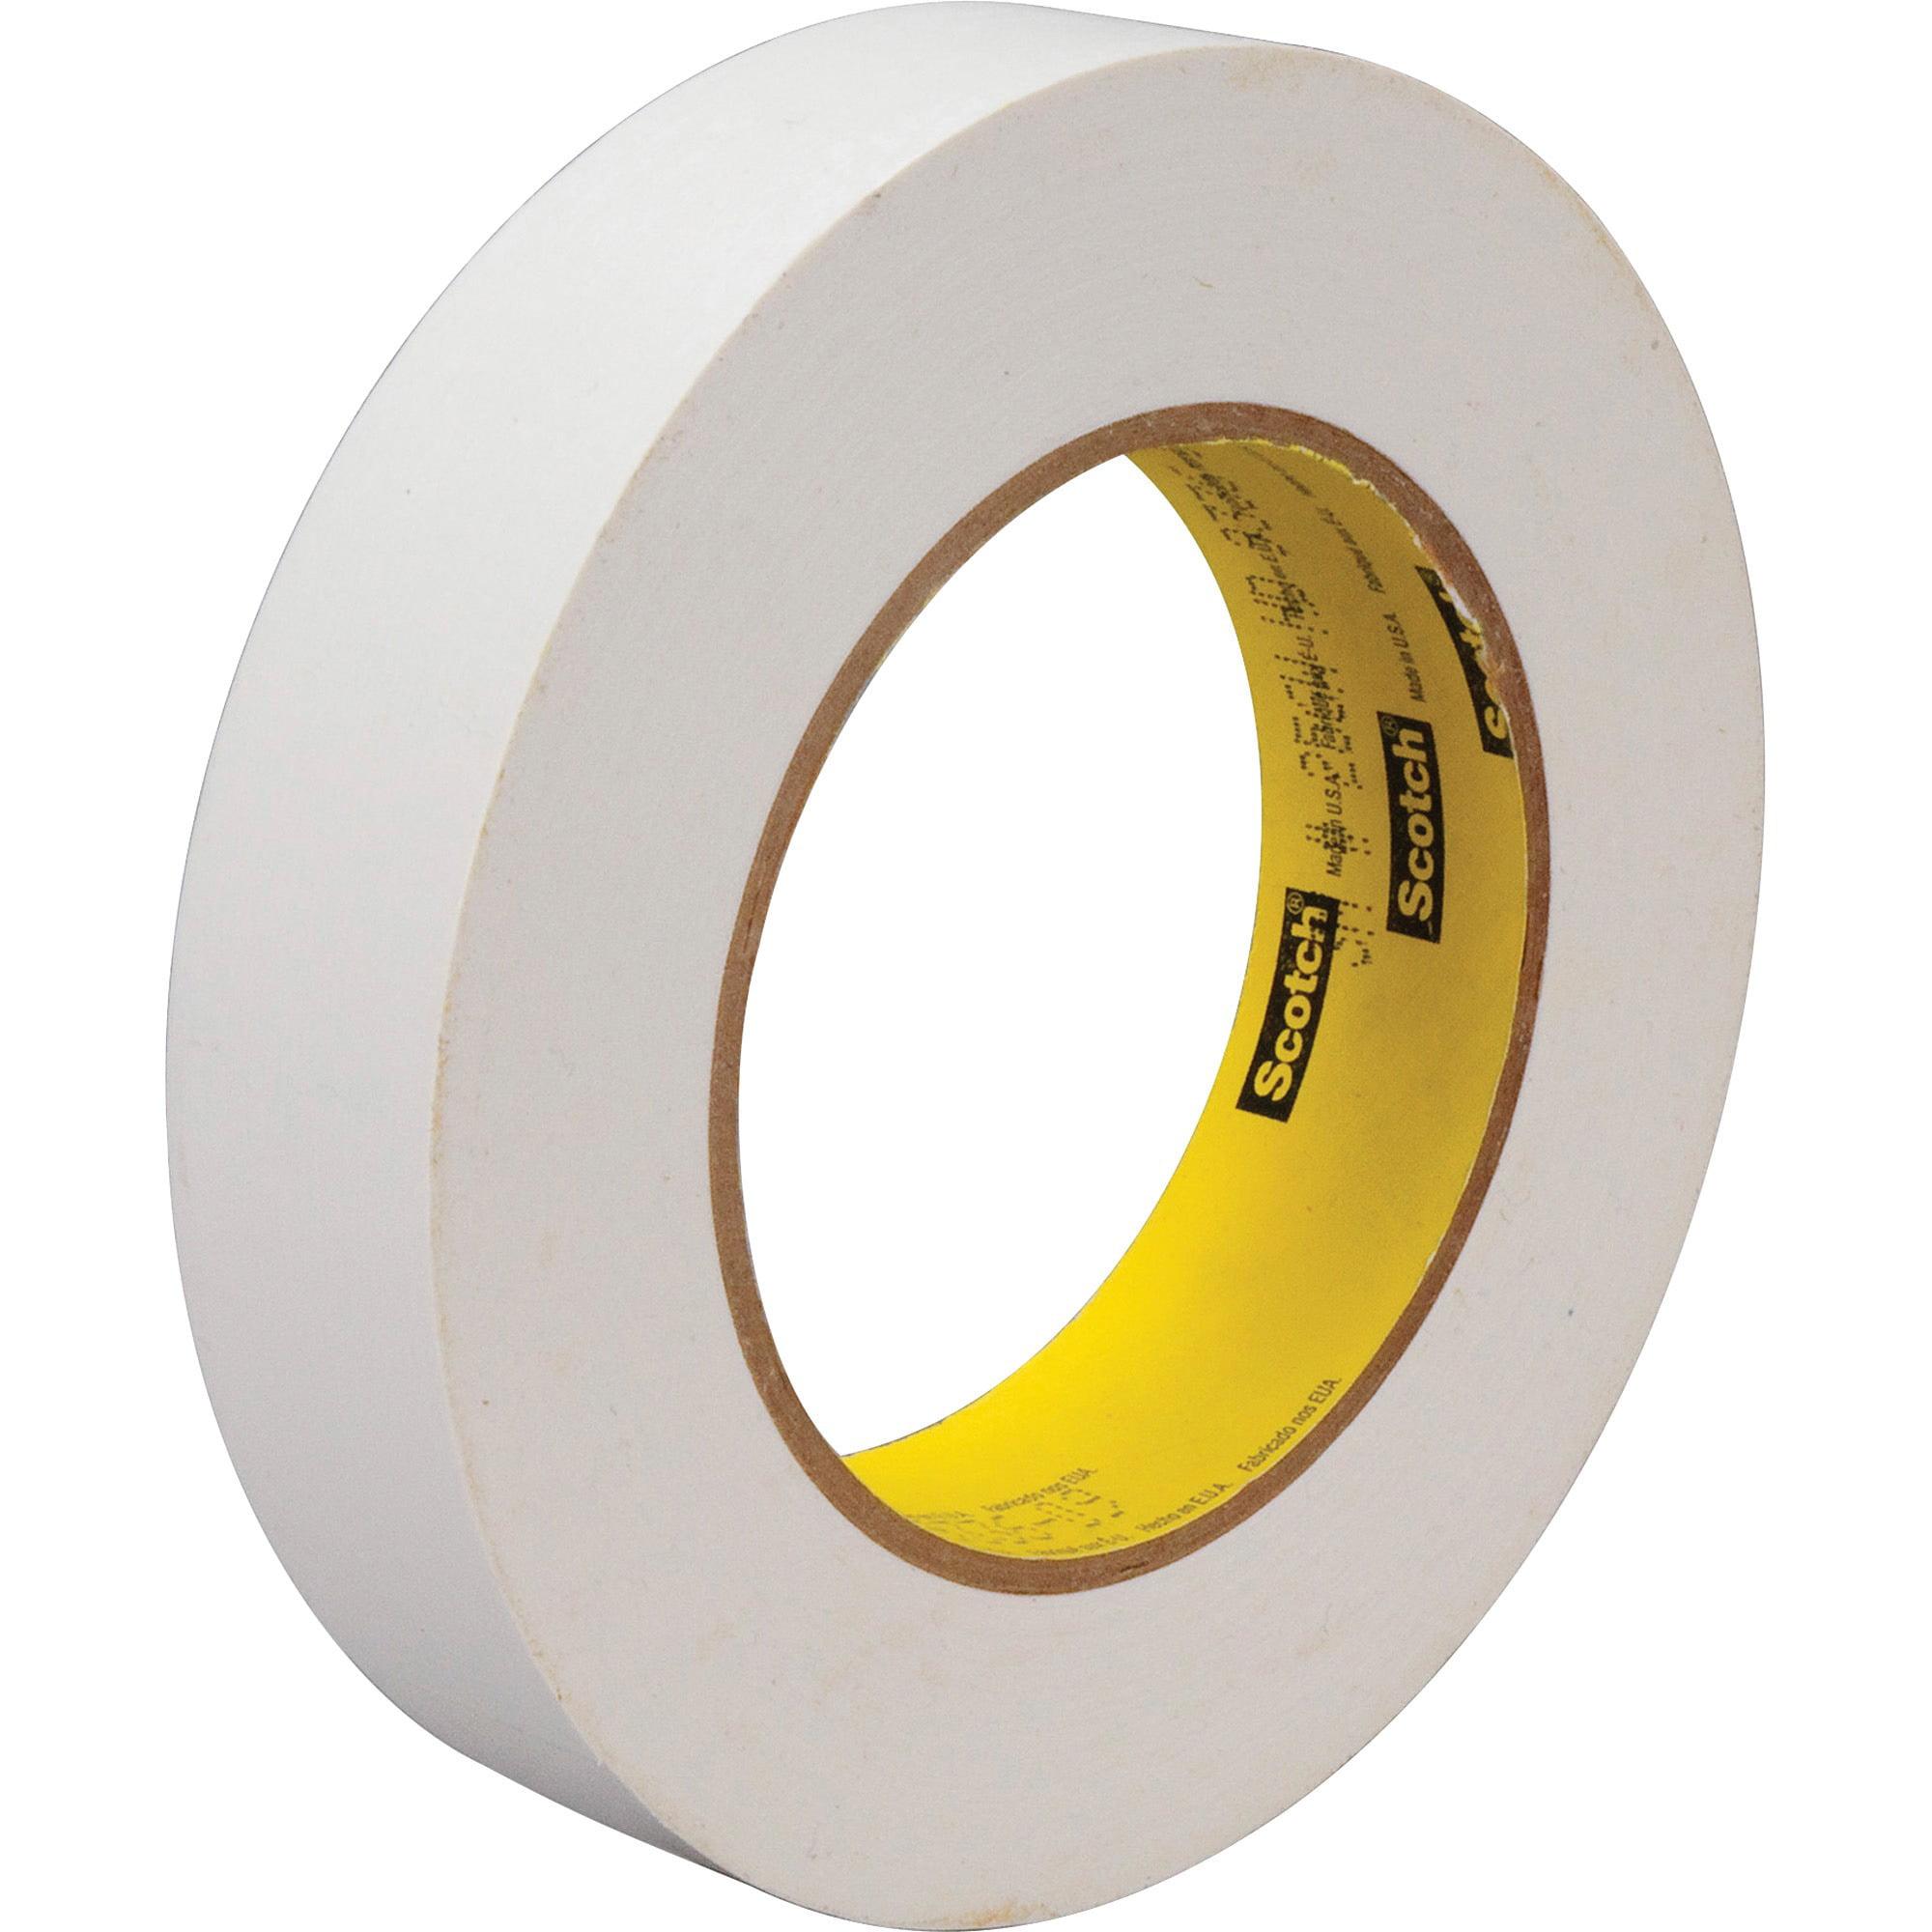 Scotch, MMM2561, Flatback Write-On Paper Tape, 1 / Roll, White